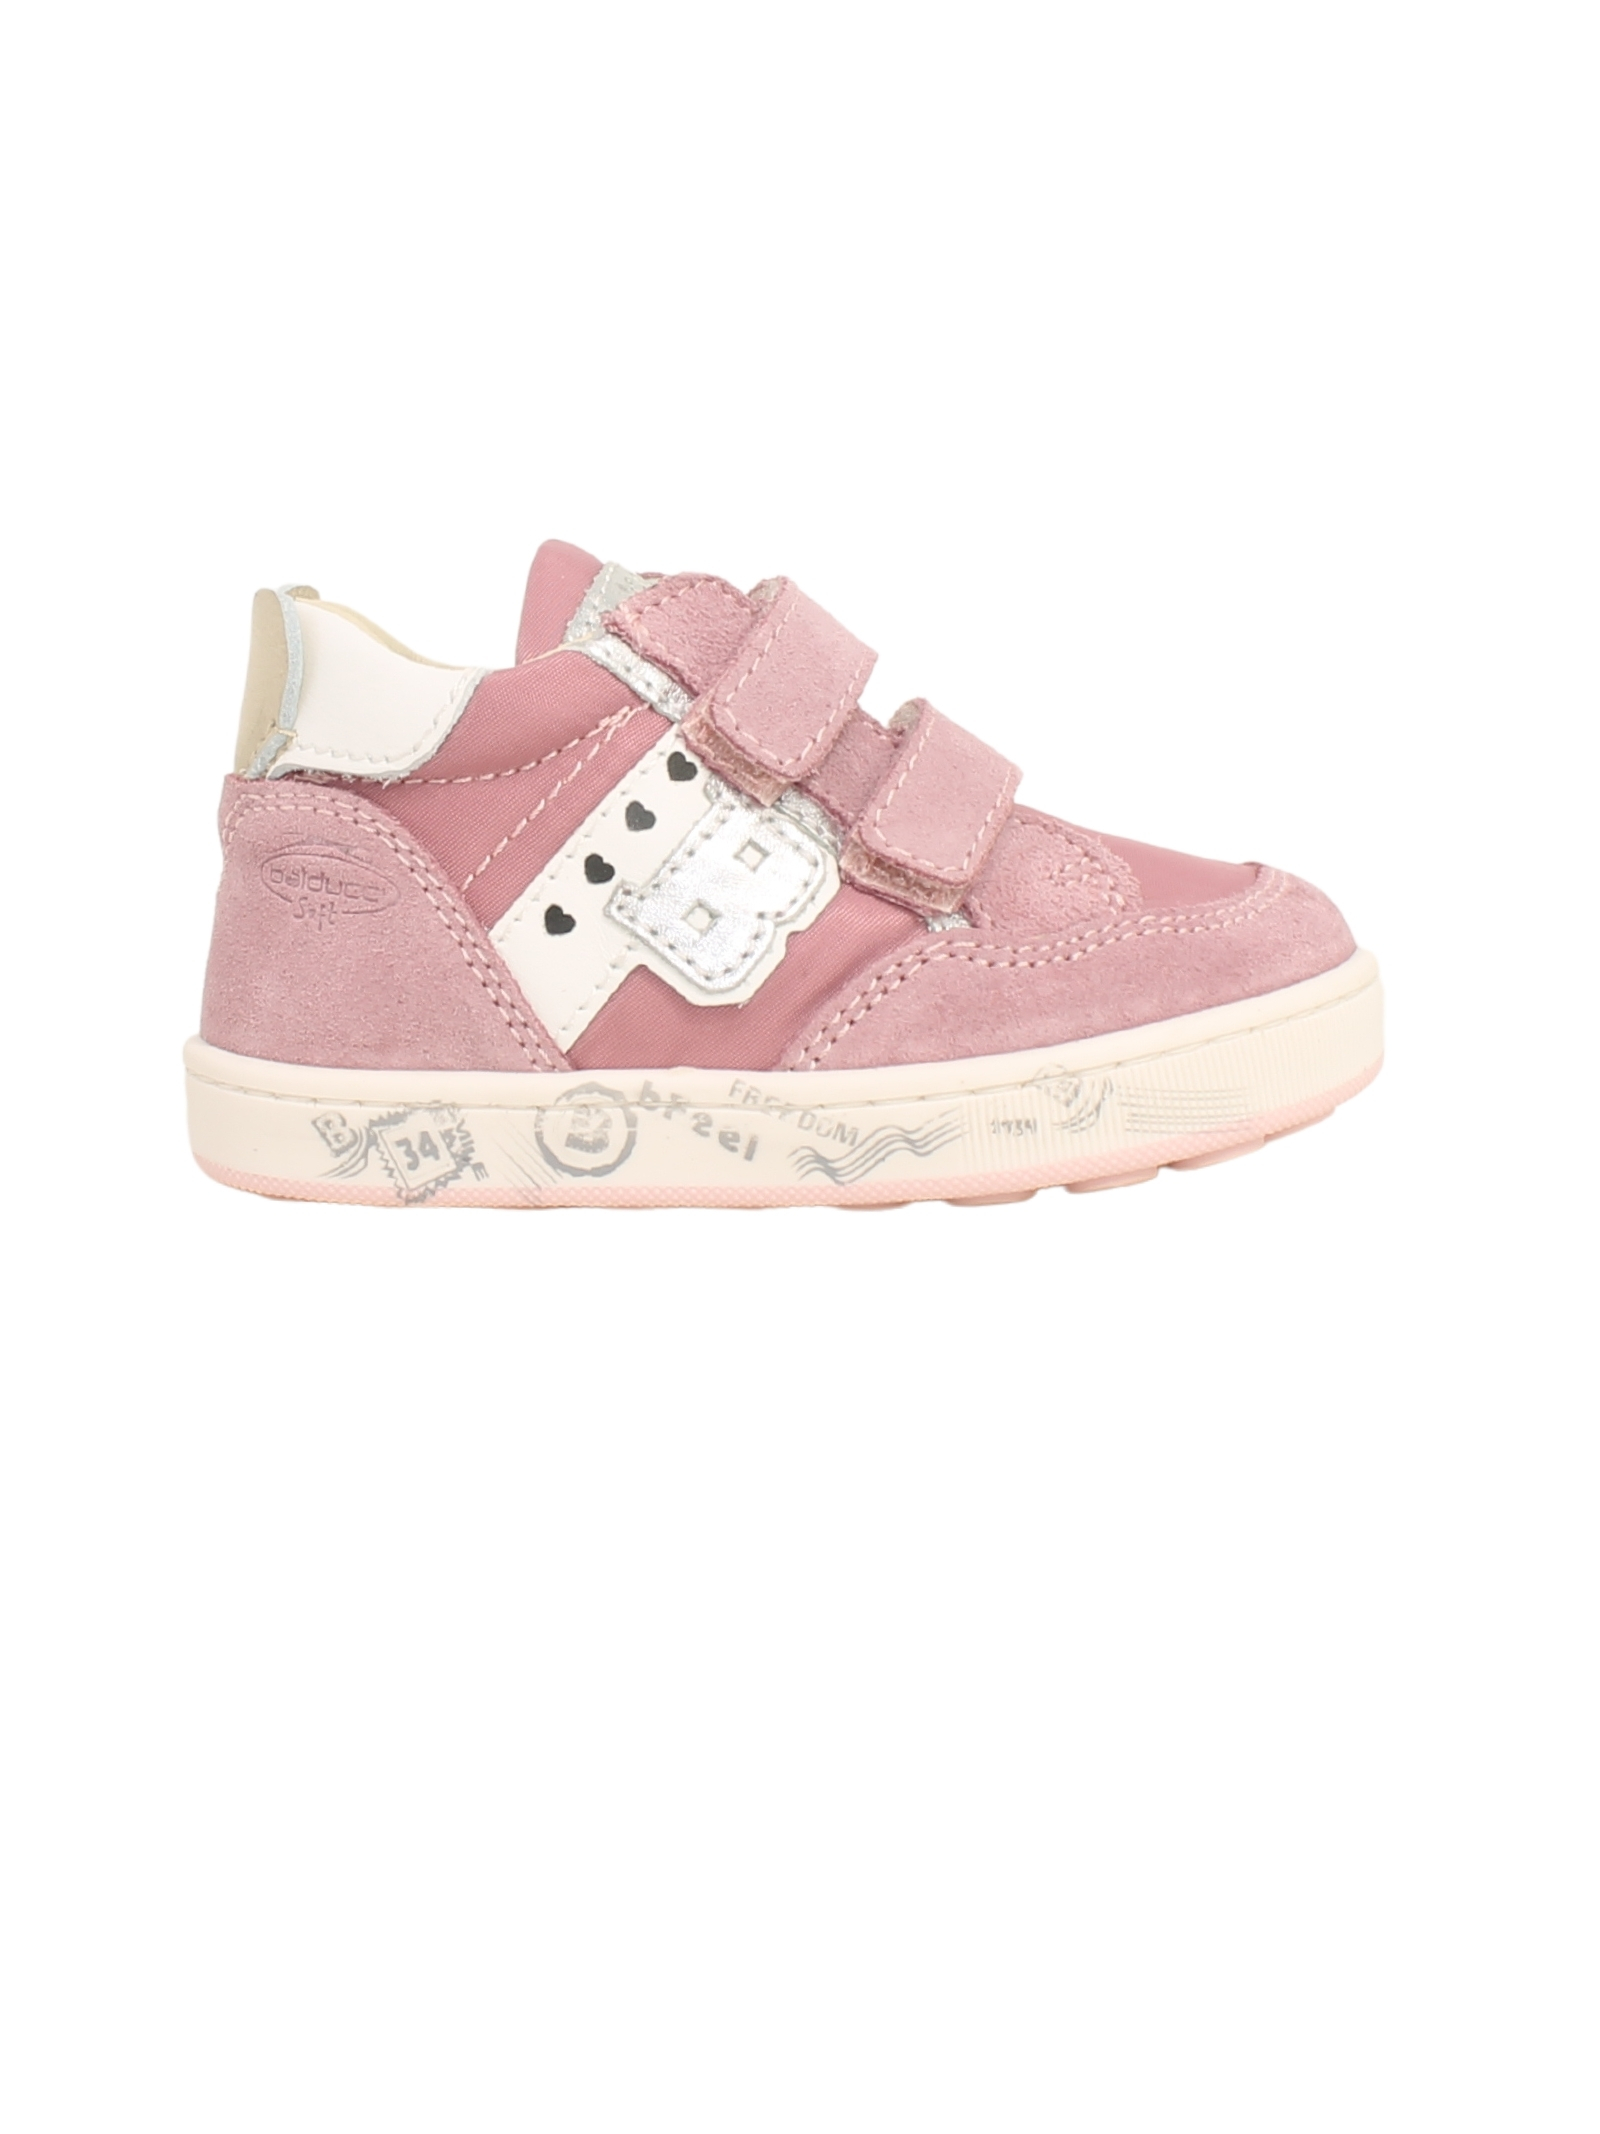 Heart Sneakers for Girls BALDUCCI | Sneakers | CSPO4906ROSA